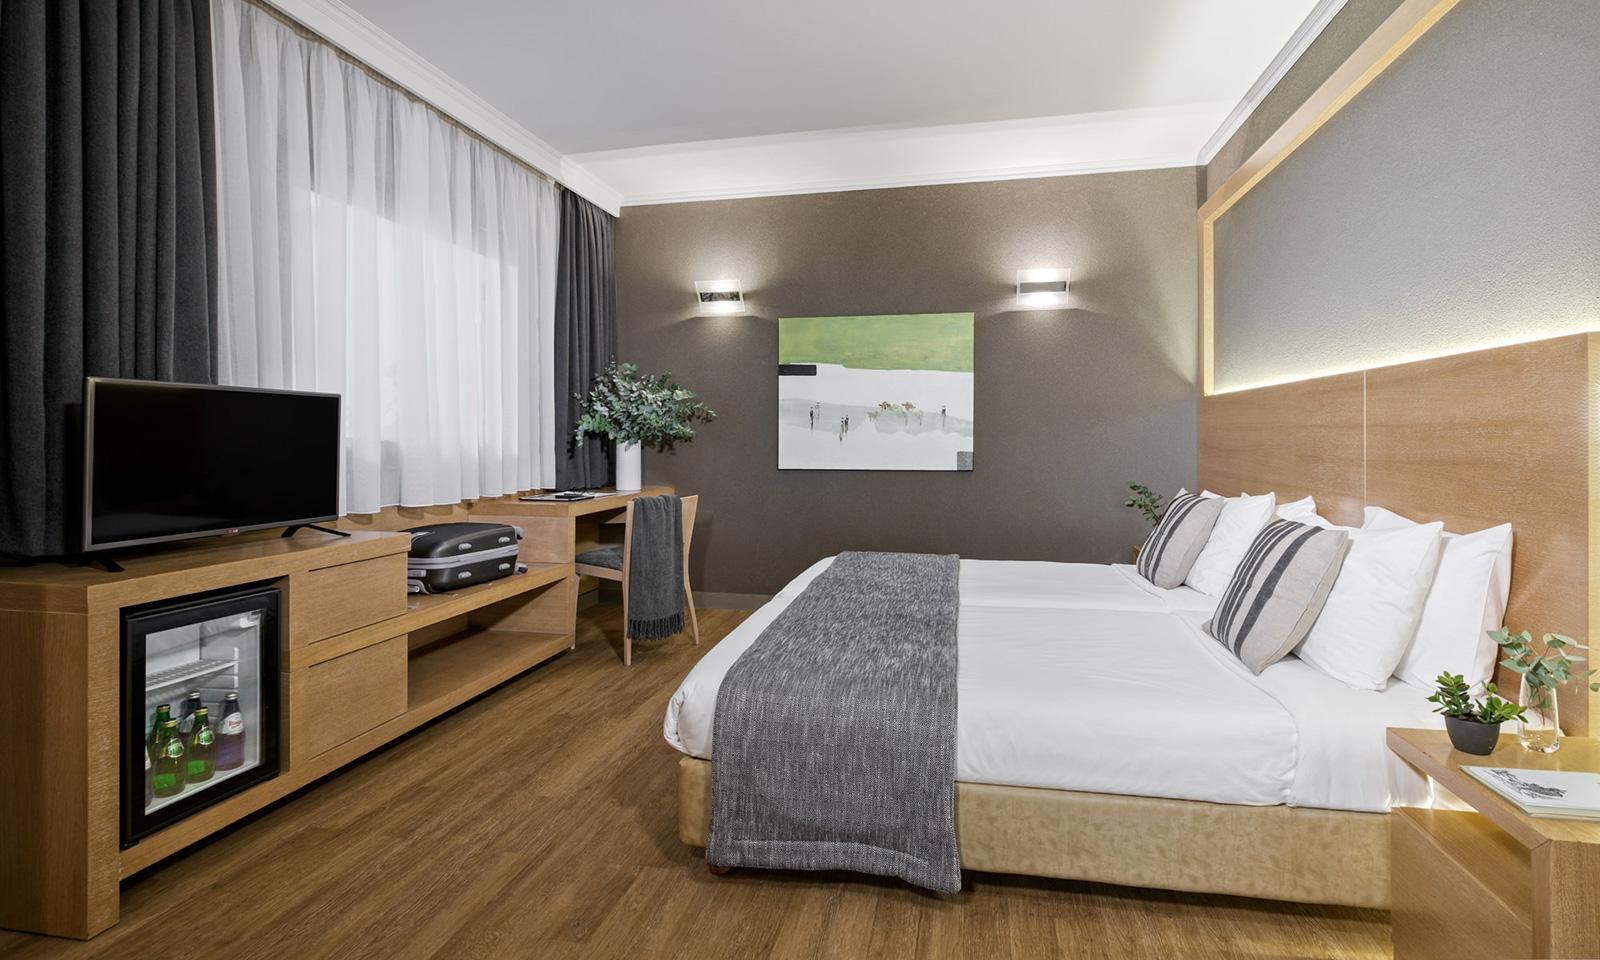 c7269940234 Ξενοδοχείο Porto Palace Hotel Θεσσαλονίκη, Ξενοδοχεία Θεσσαλονίκη